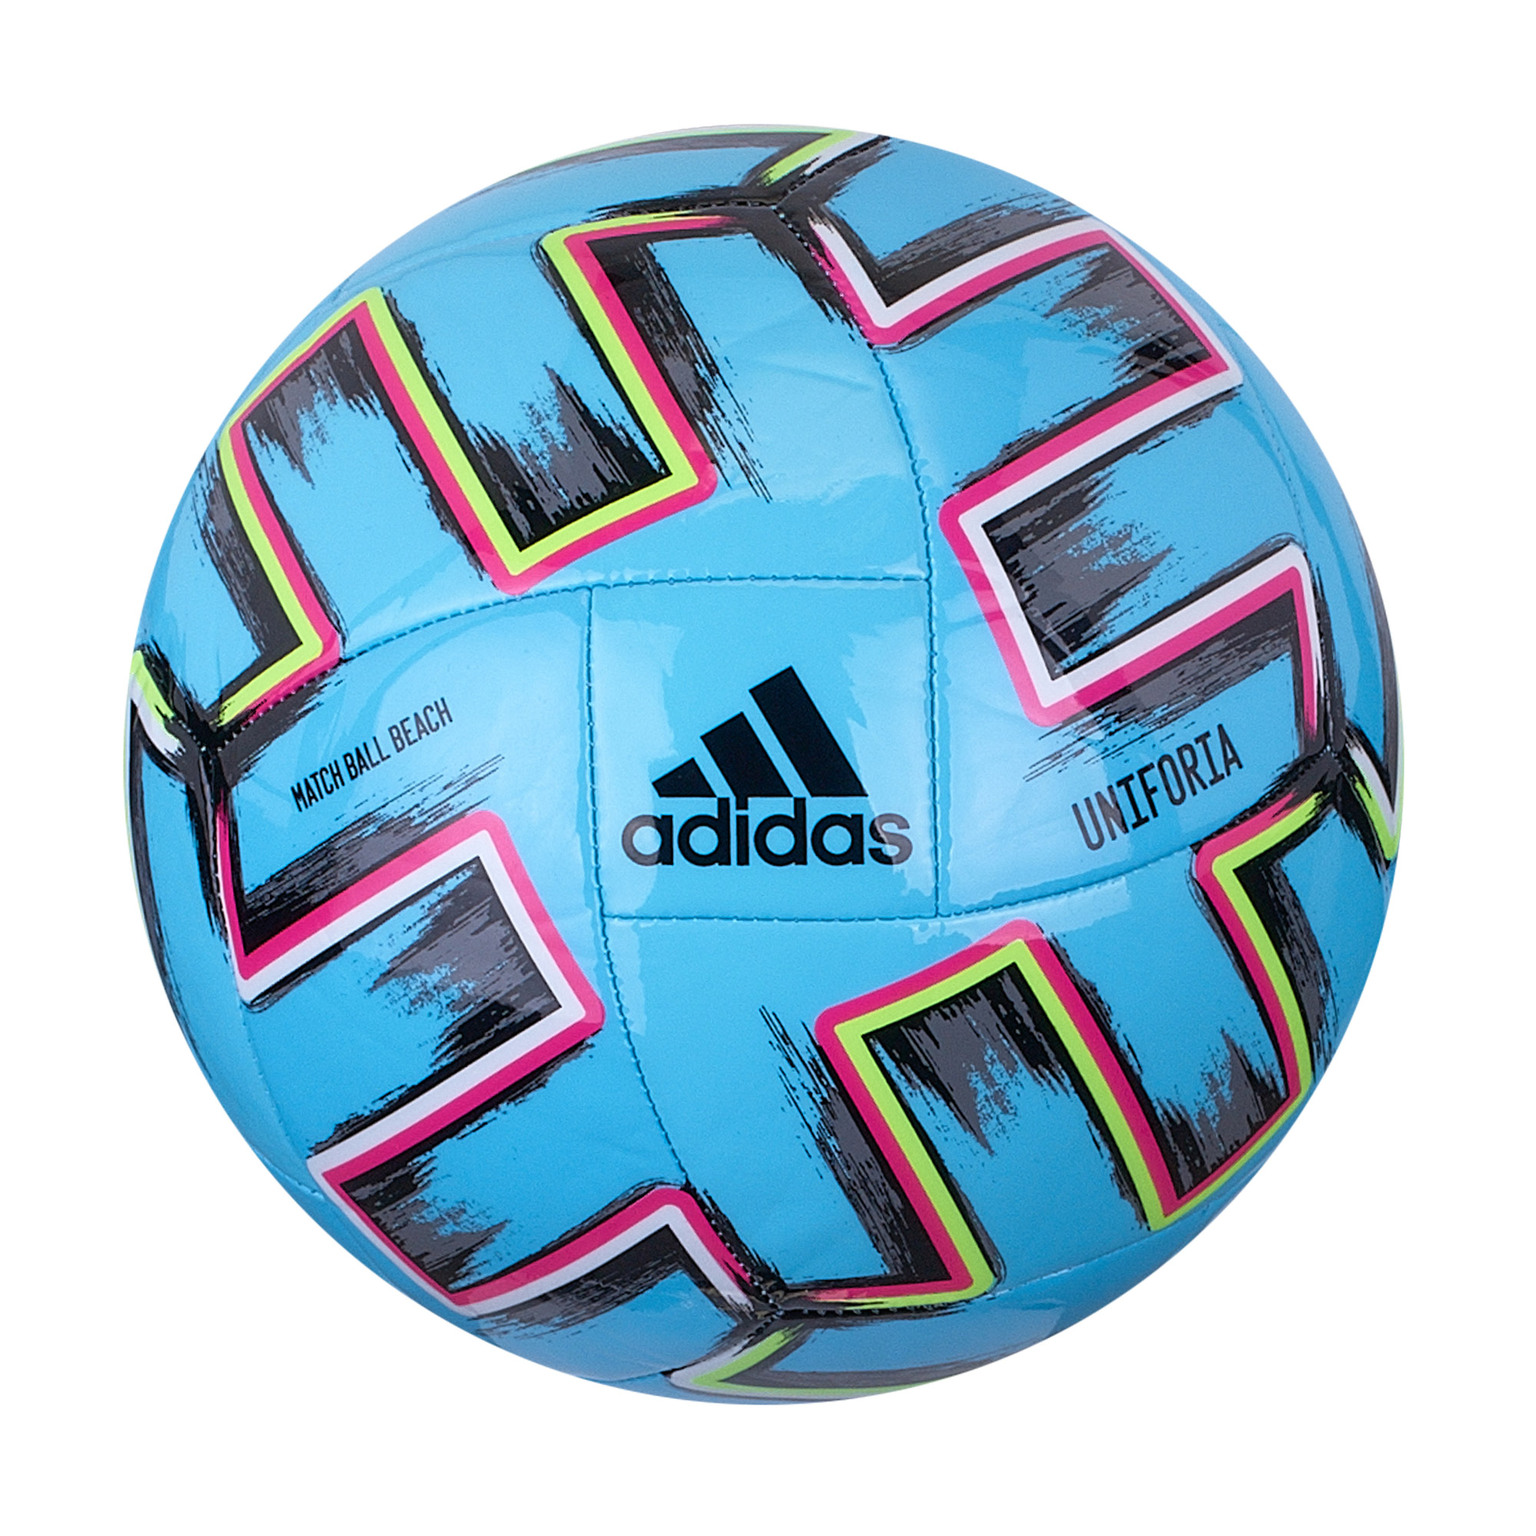 Мяч для пляжного футбола Adidas Uniforia FH7347 мяч для американского футбола wilson nfl extreme f1645x